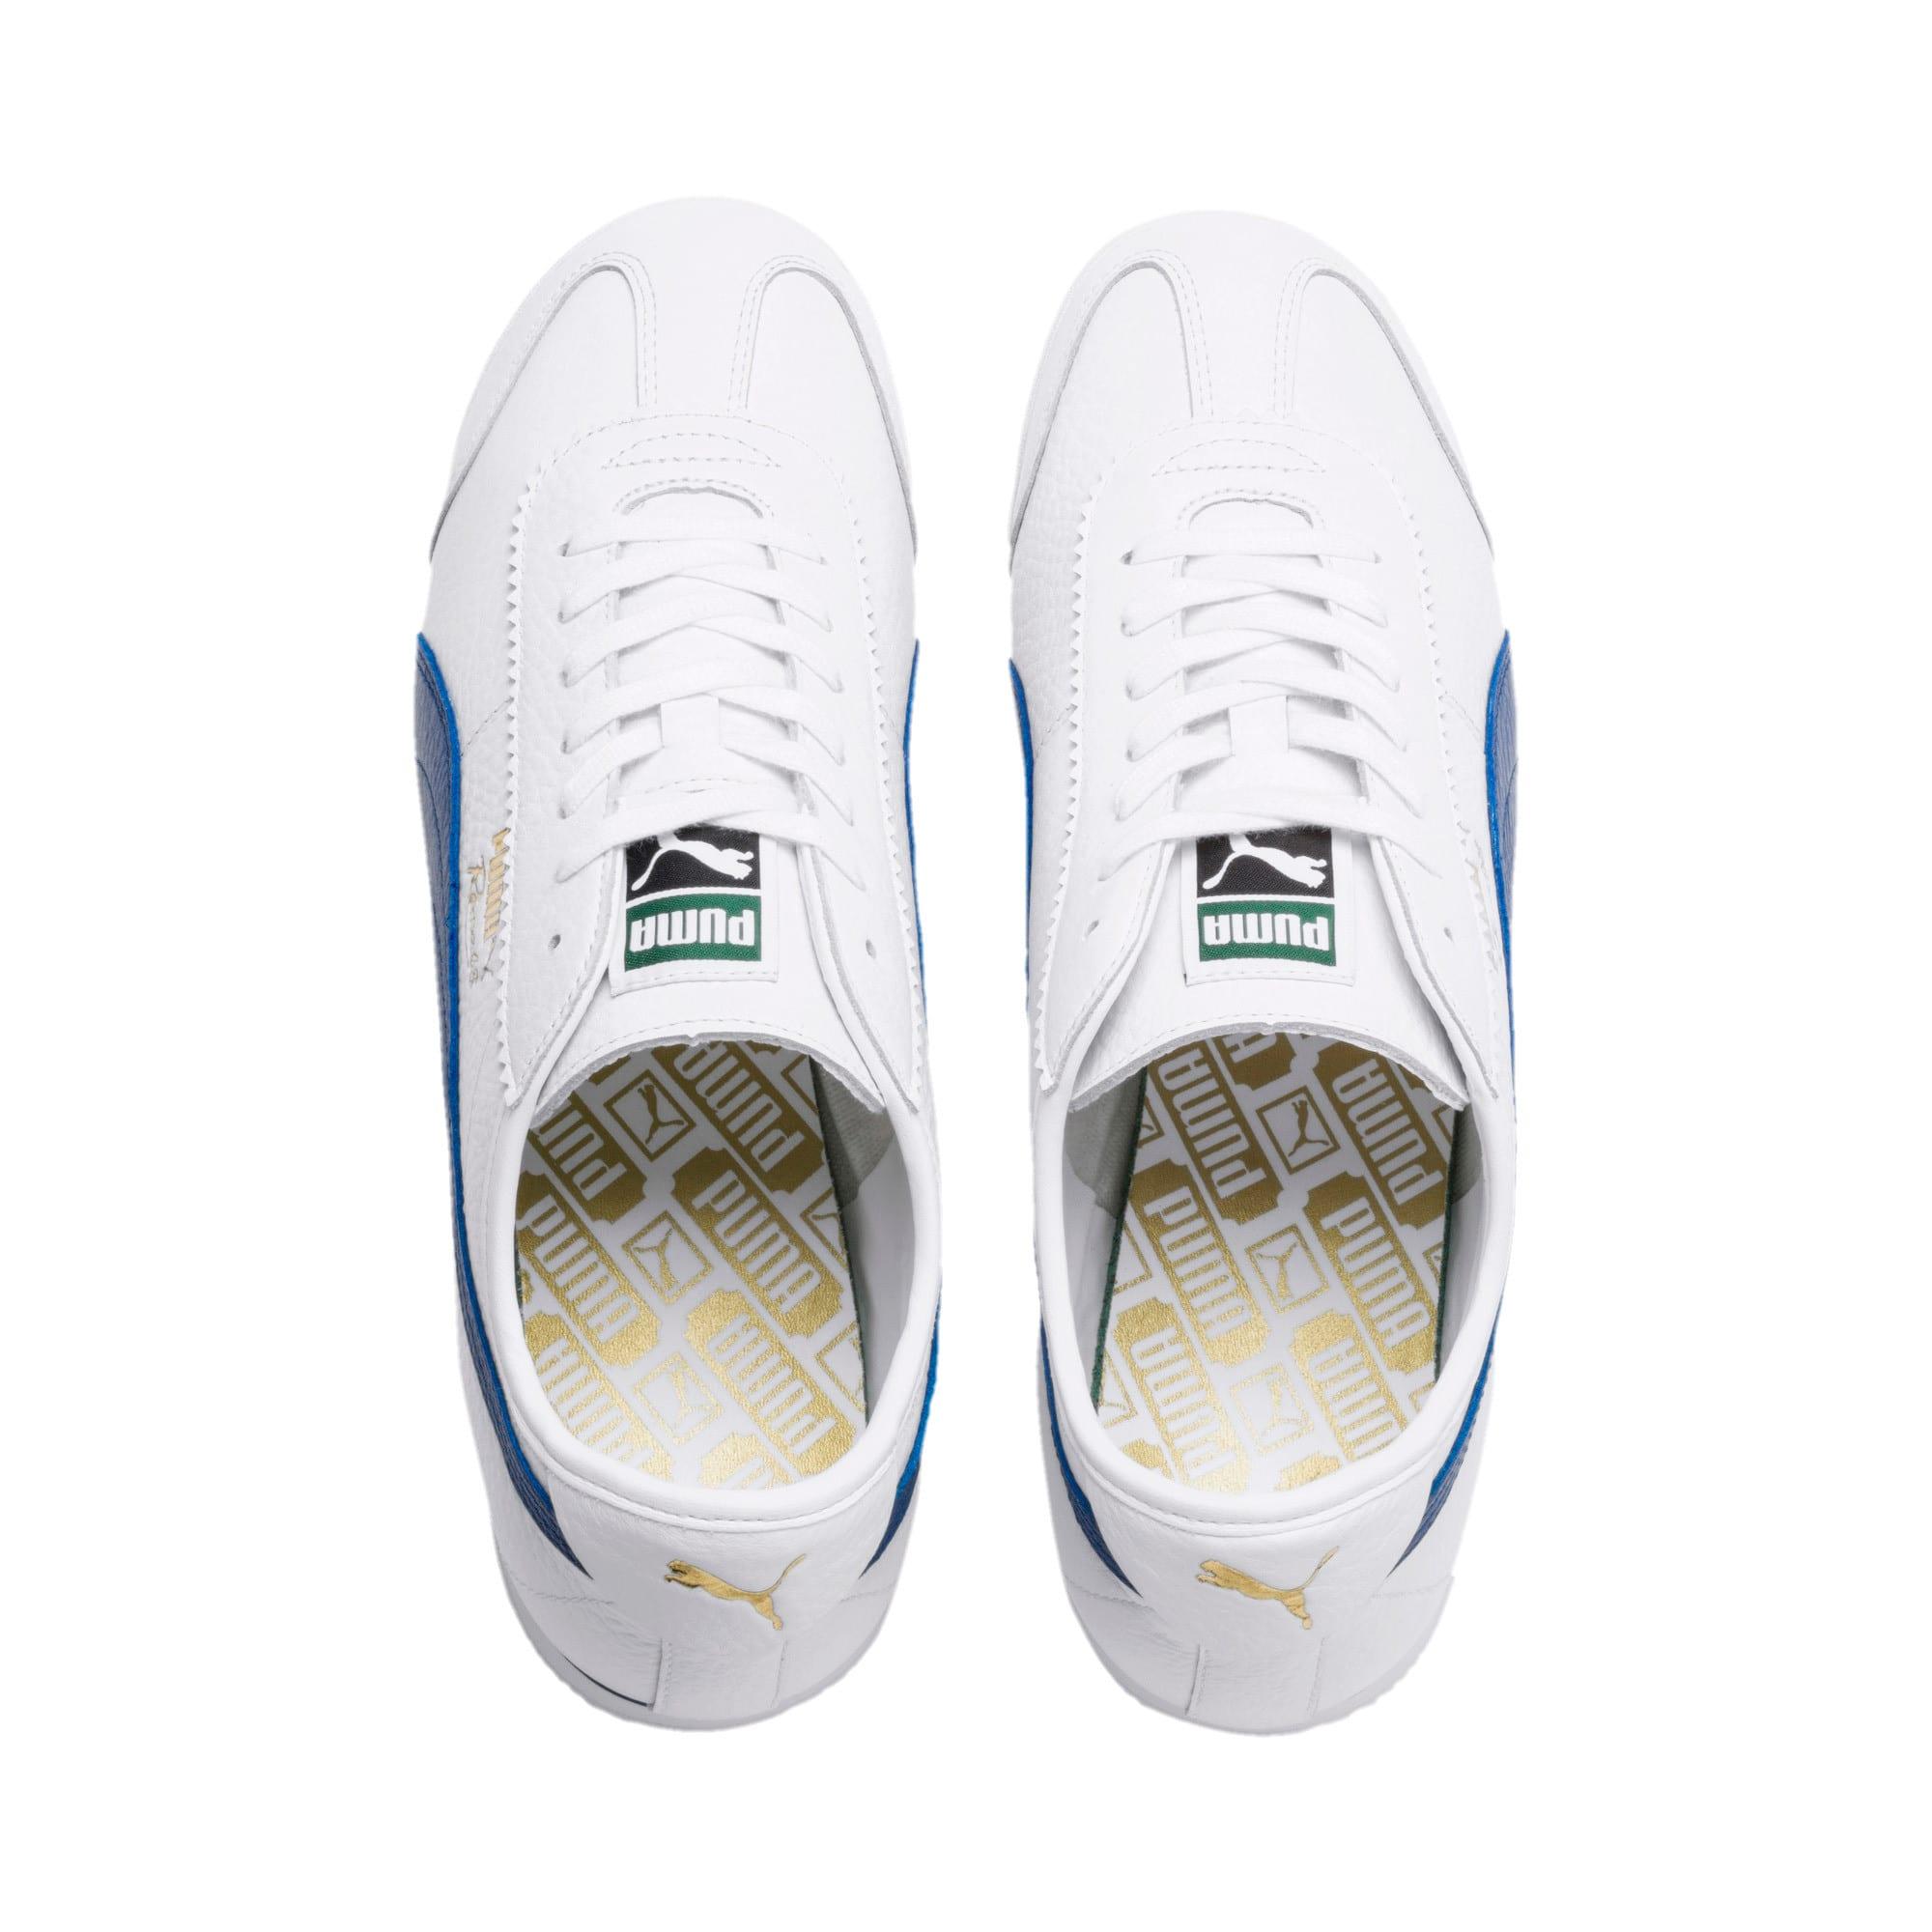 Thumbnail 7 of Roma '68 Vintage Sneakers, Puma White-Galaxy Blue, medium